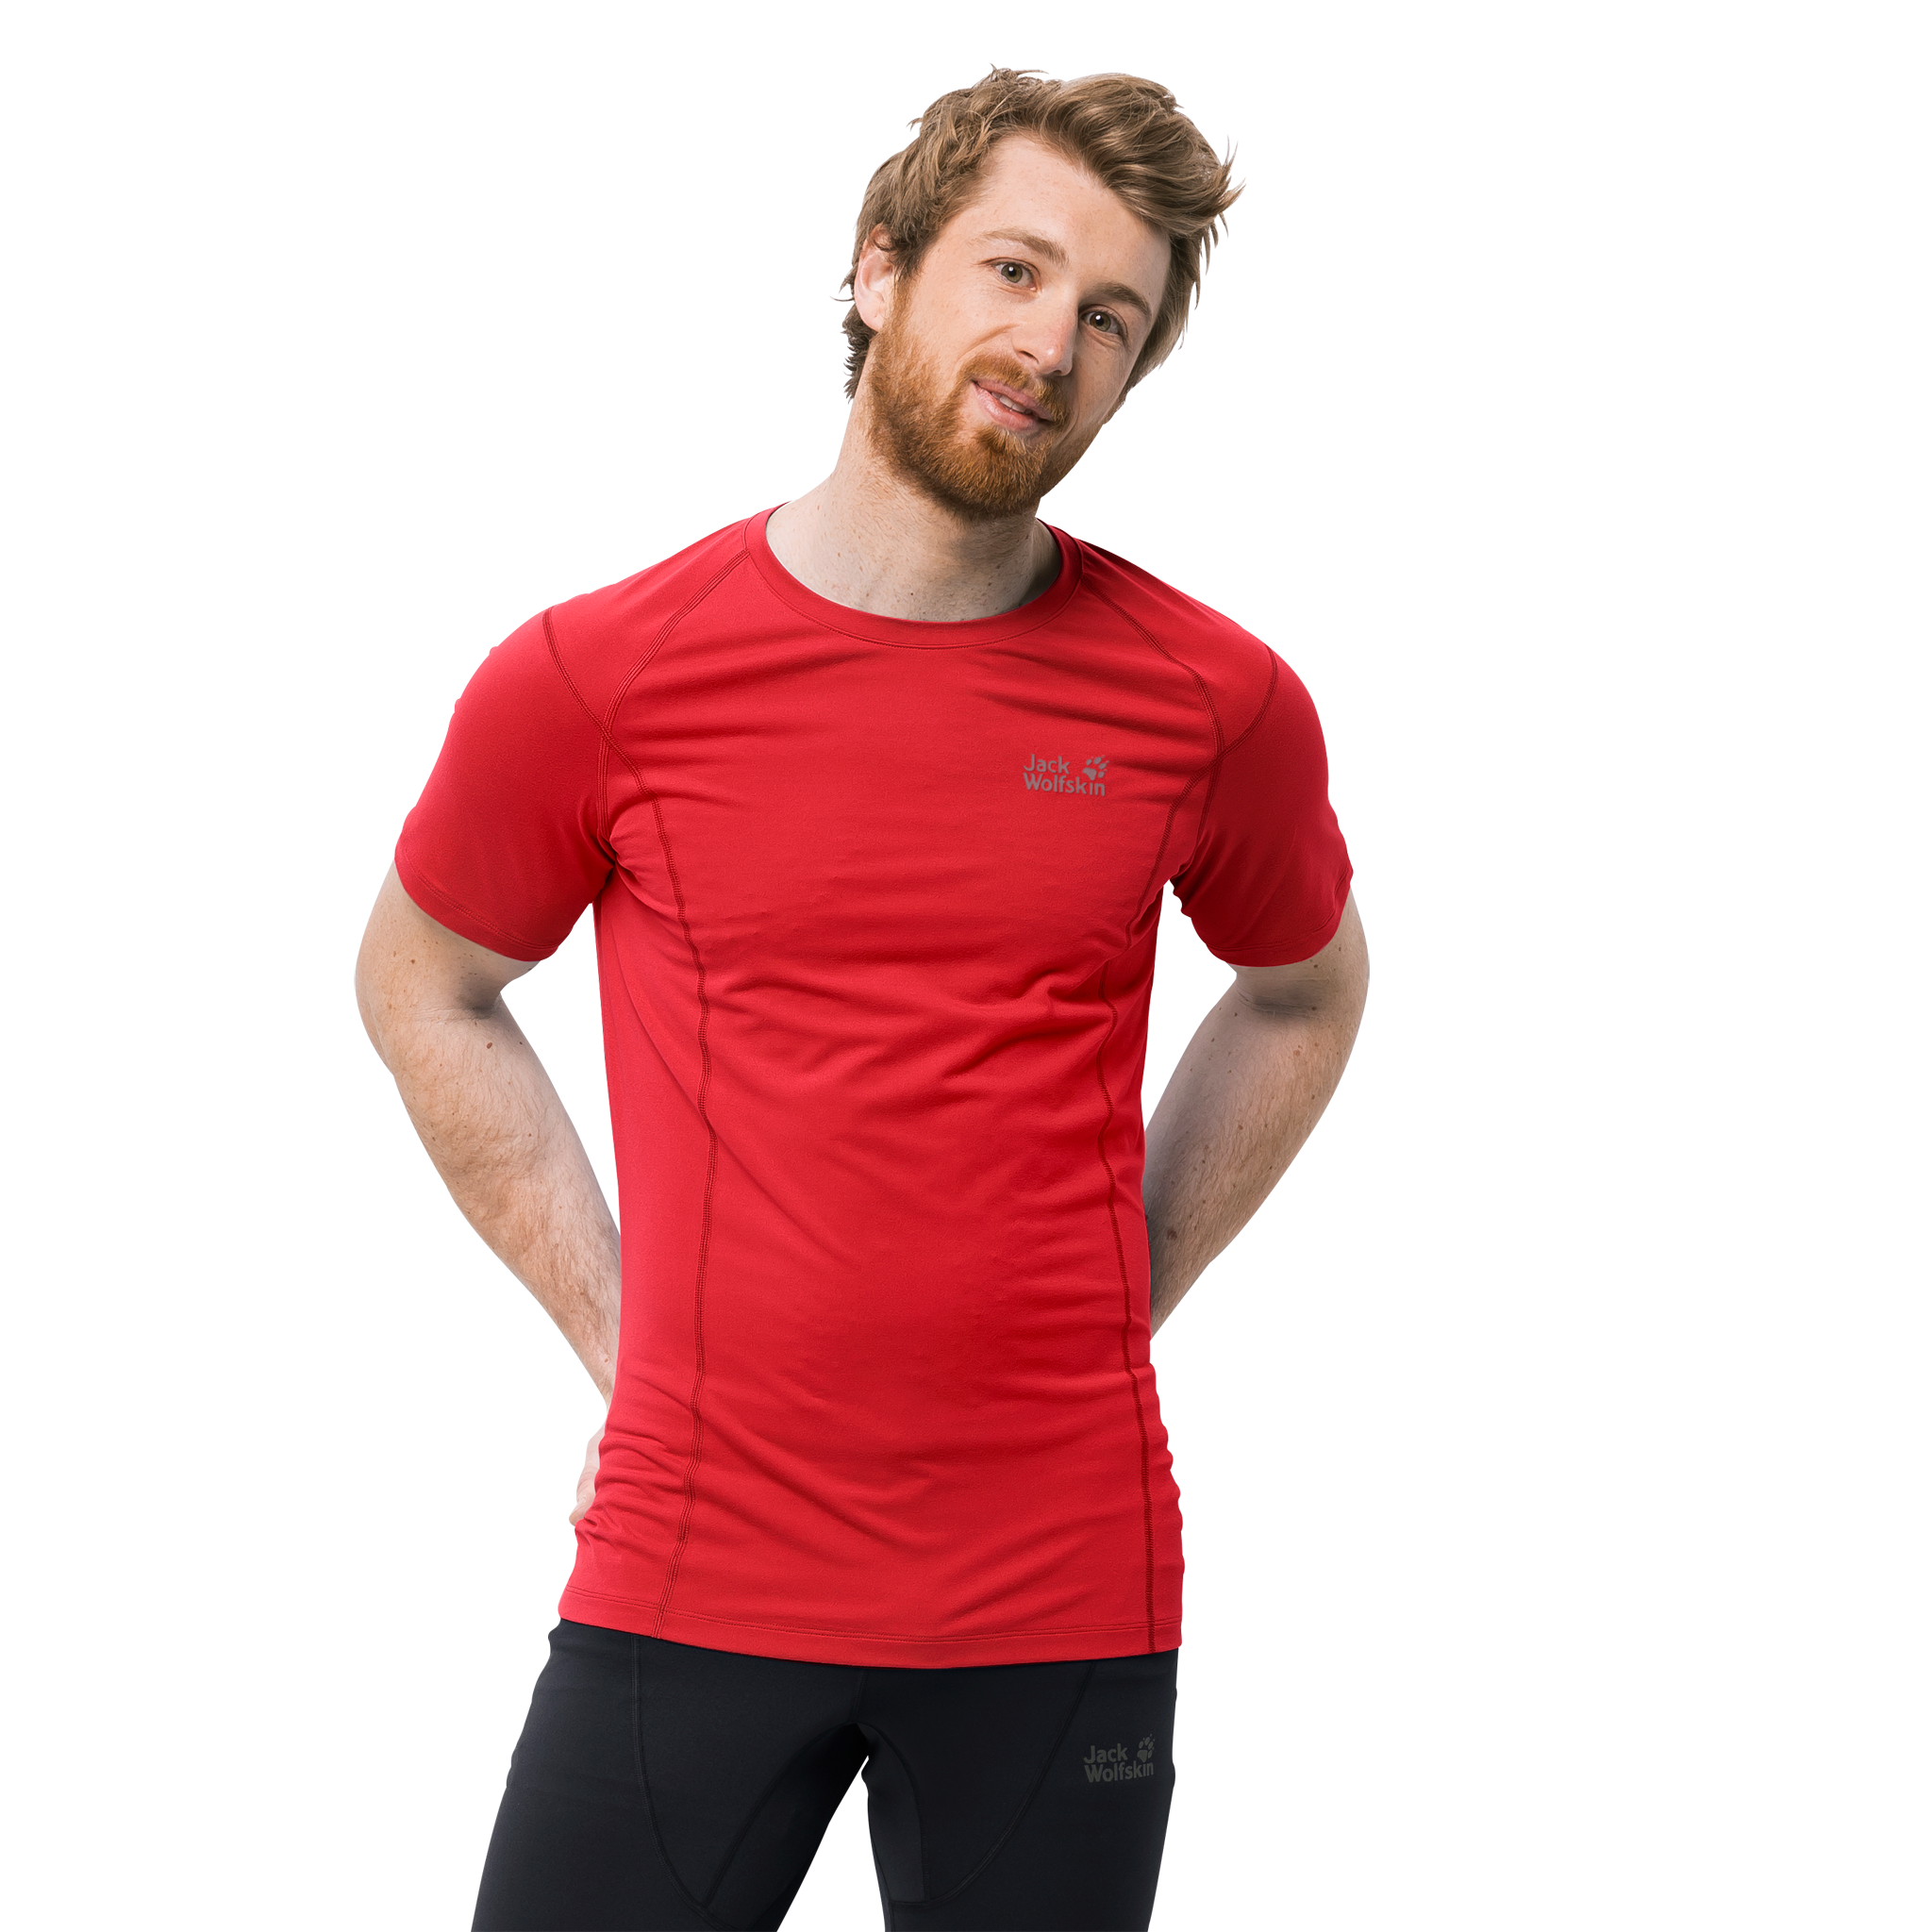 23475562839aca Koszulka HOLLOW RANGE T-SHIRT MEN ruby red   odzież \ męska ...